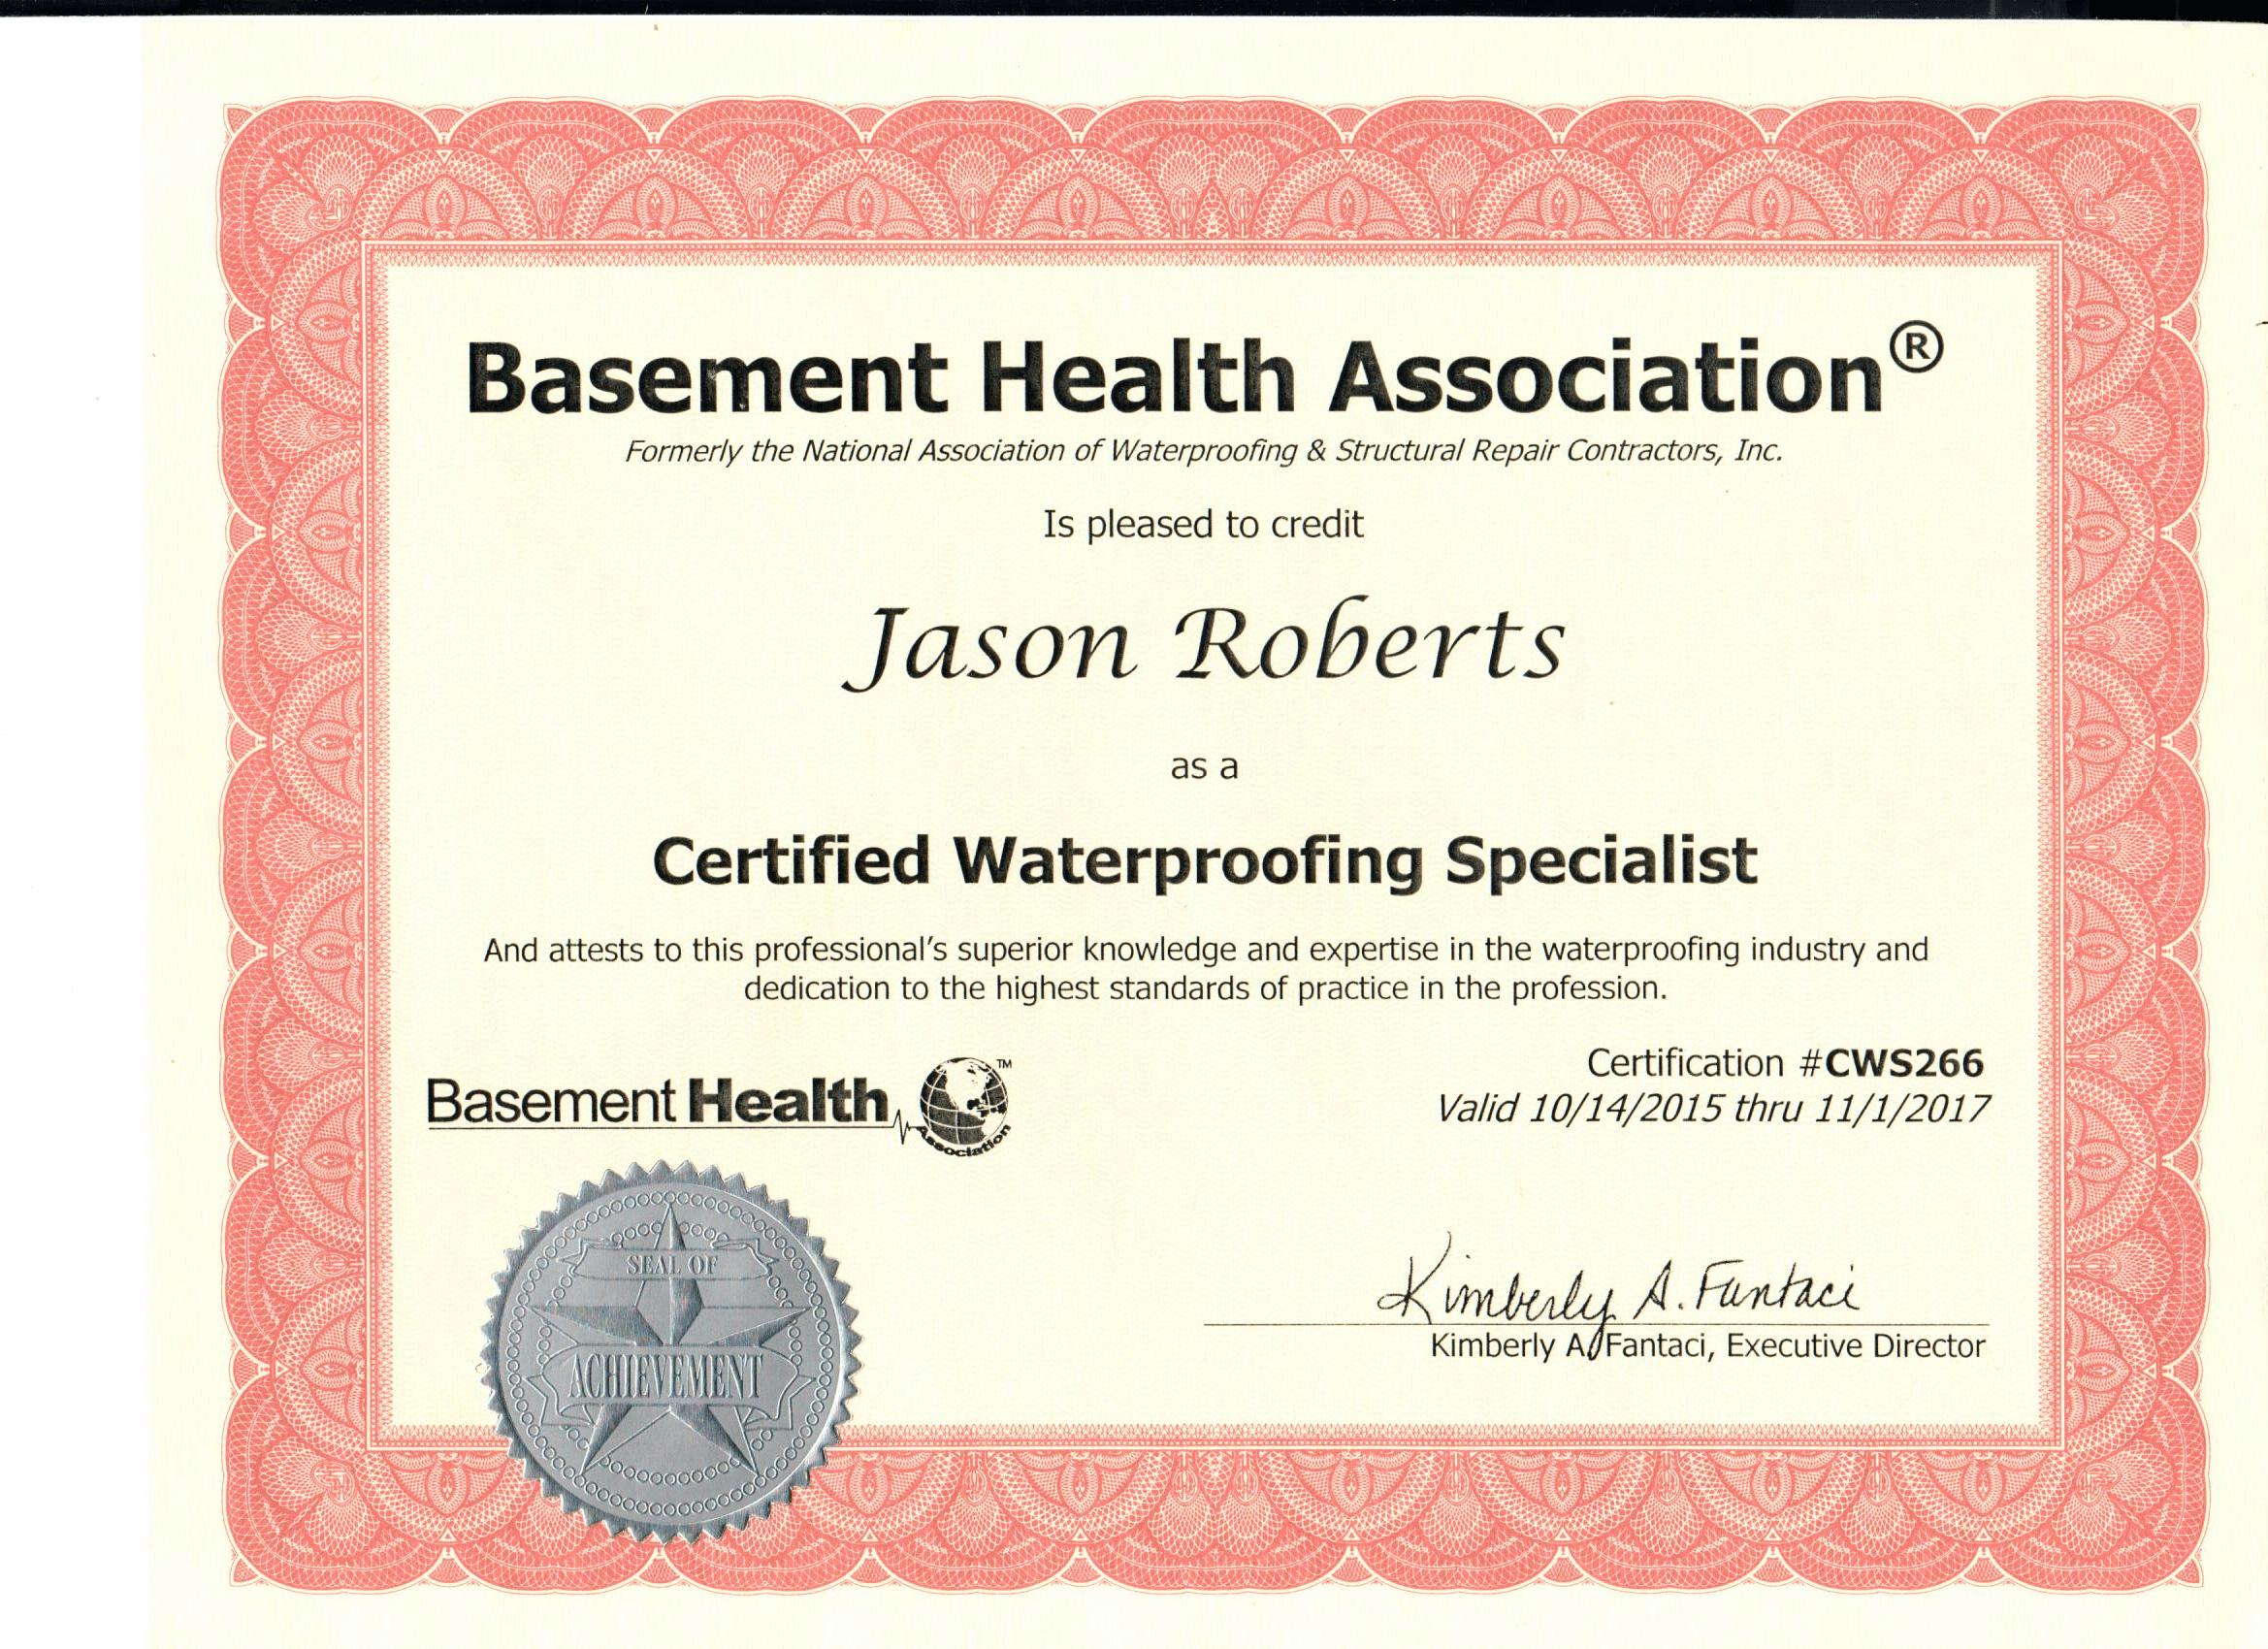 Everdry Basement Waterproofing Atlanta | Basement Health Association Certified Award Jason Roberts